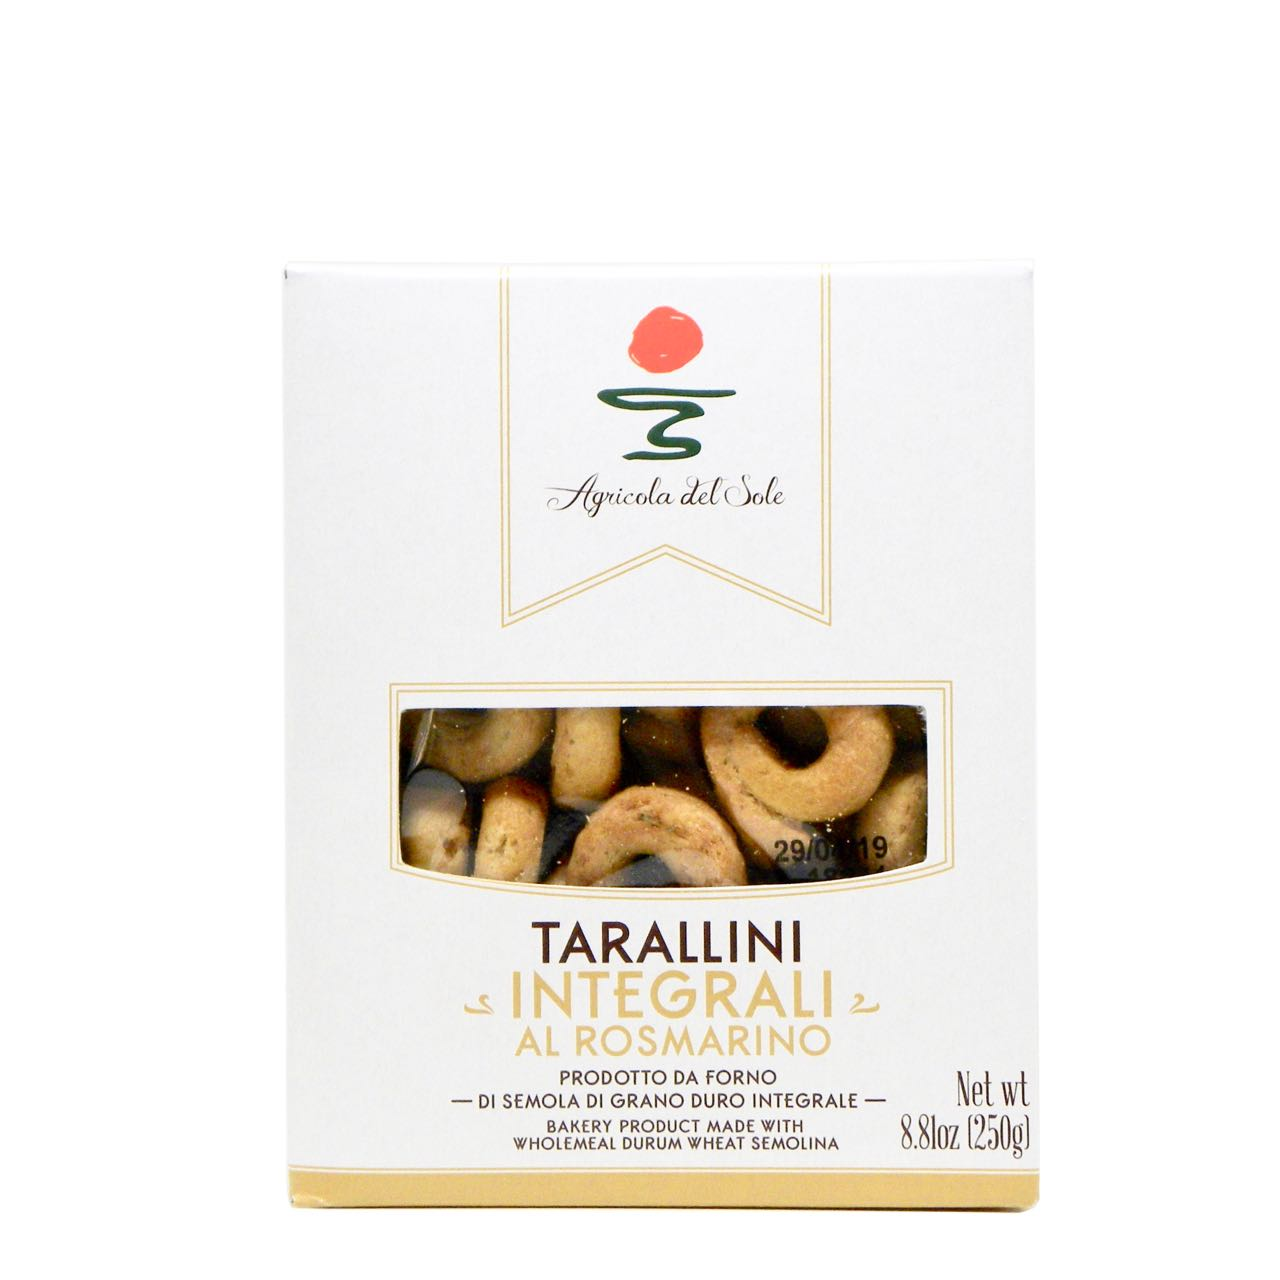 Tarallini integrali al rosmarino Agricola del Sole – Gustorotondo Italian food boutique – I migliori cibi online – Best Italian foods online – spesa online